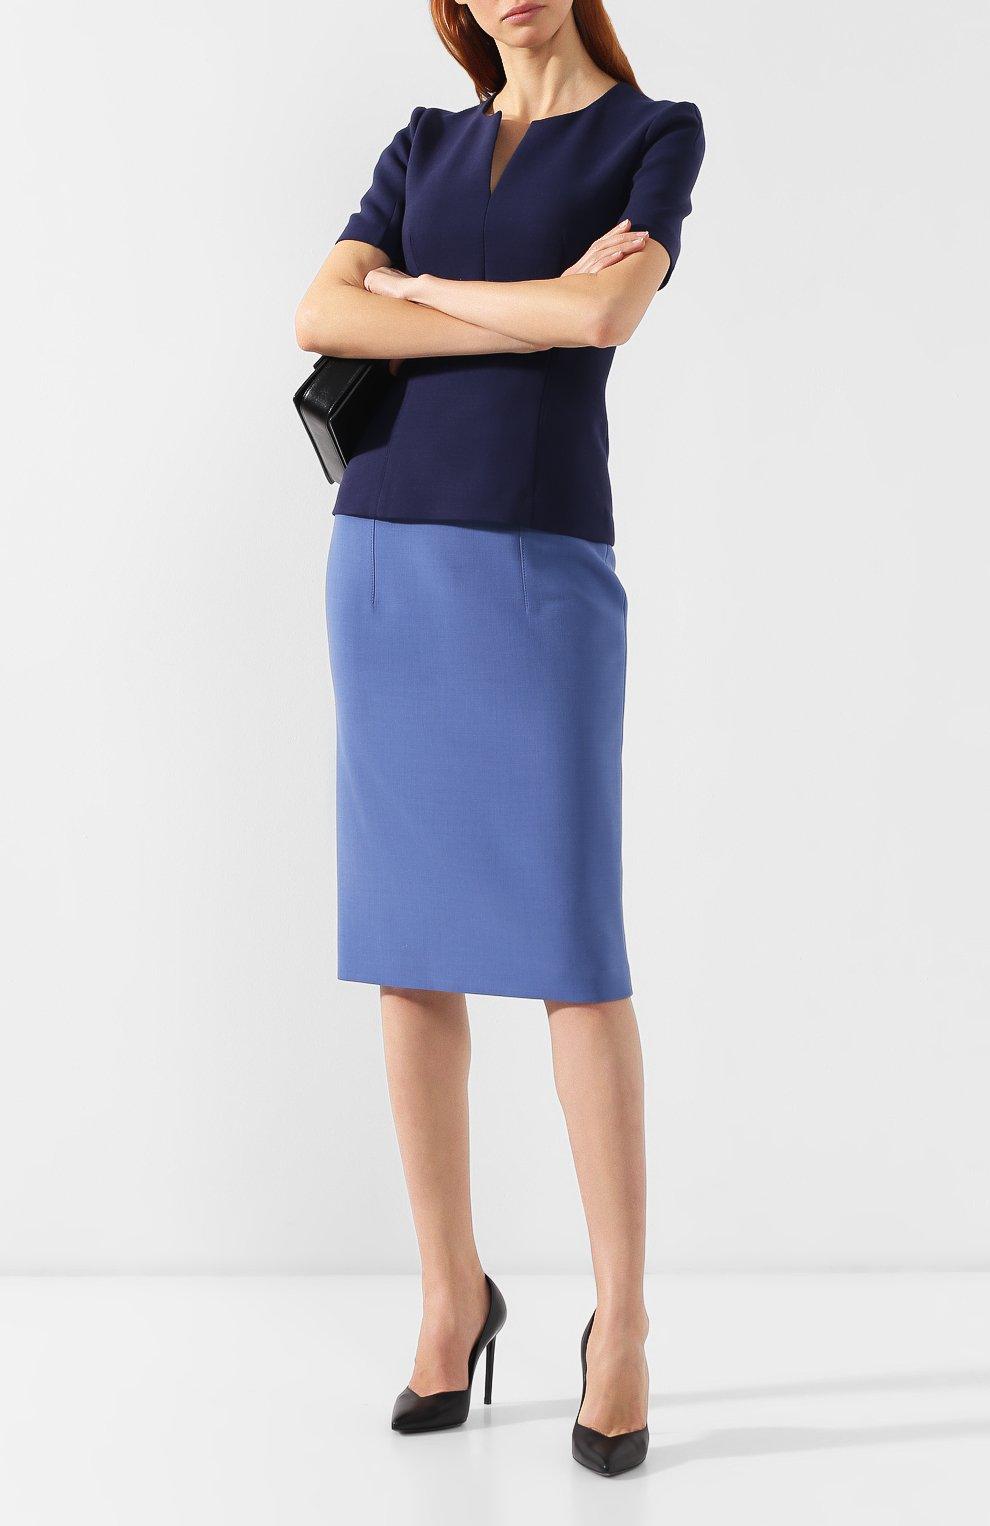 Женская юбка-карандаш BOSS голубого цвета, арт. 50400506 | Фото 2